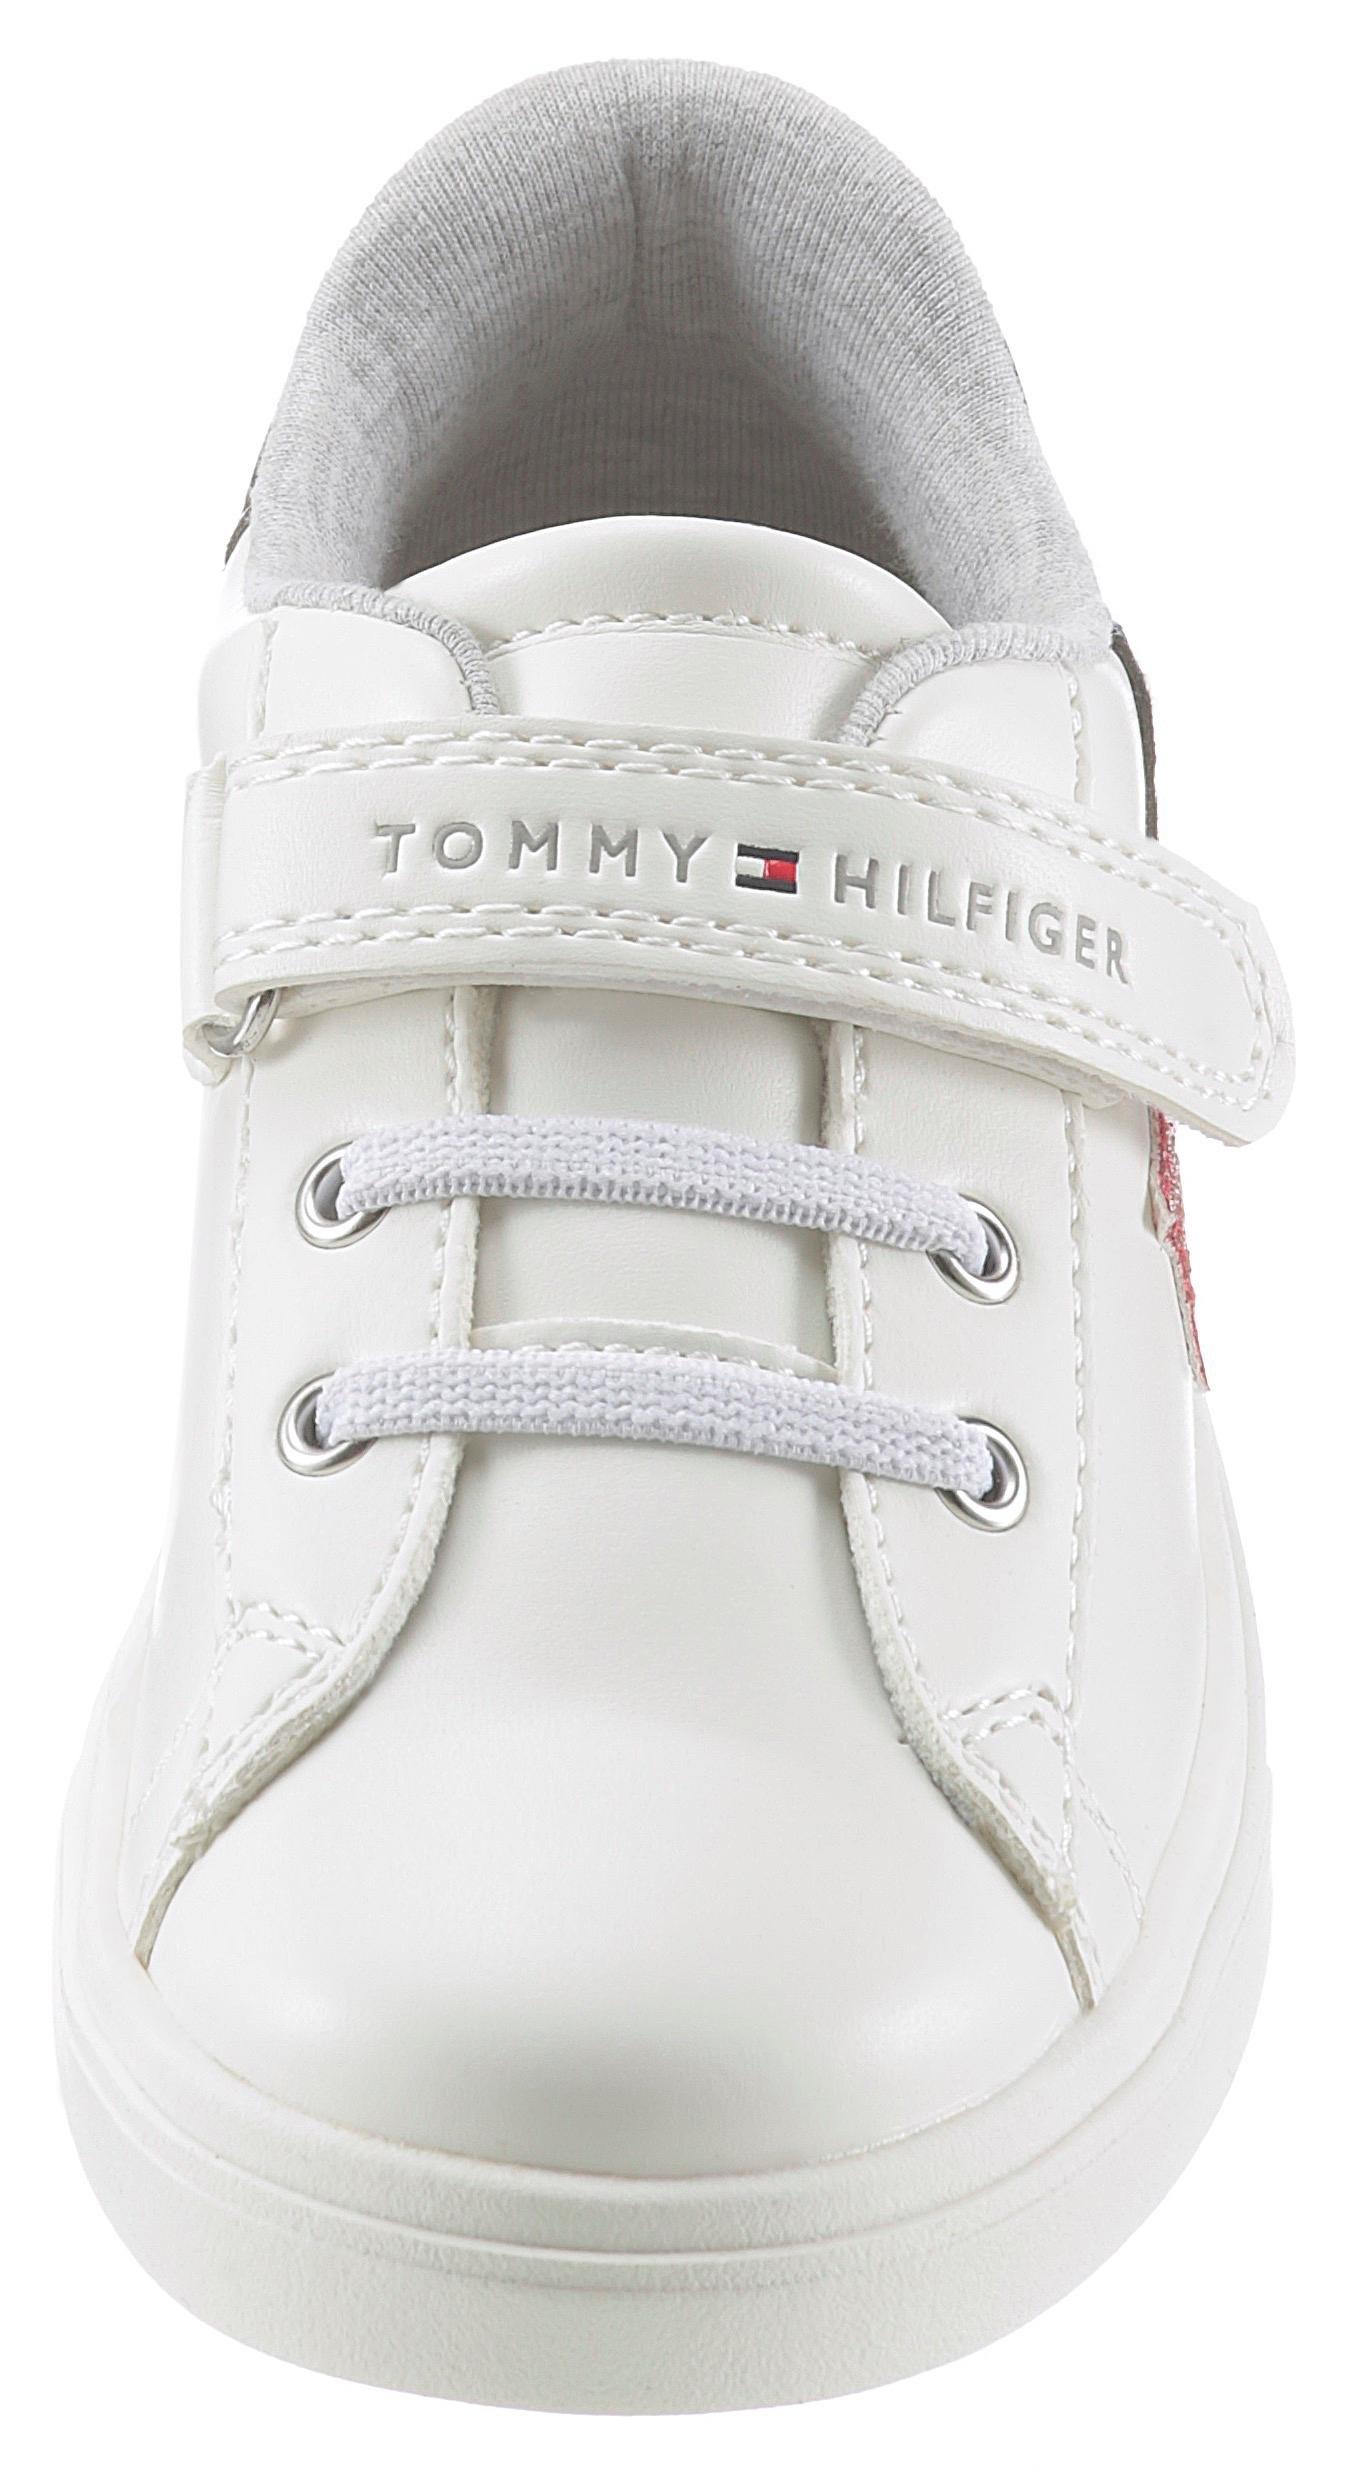 Tommy Hilfiger sneakers nu online bestellen